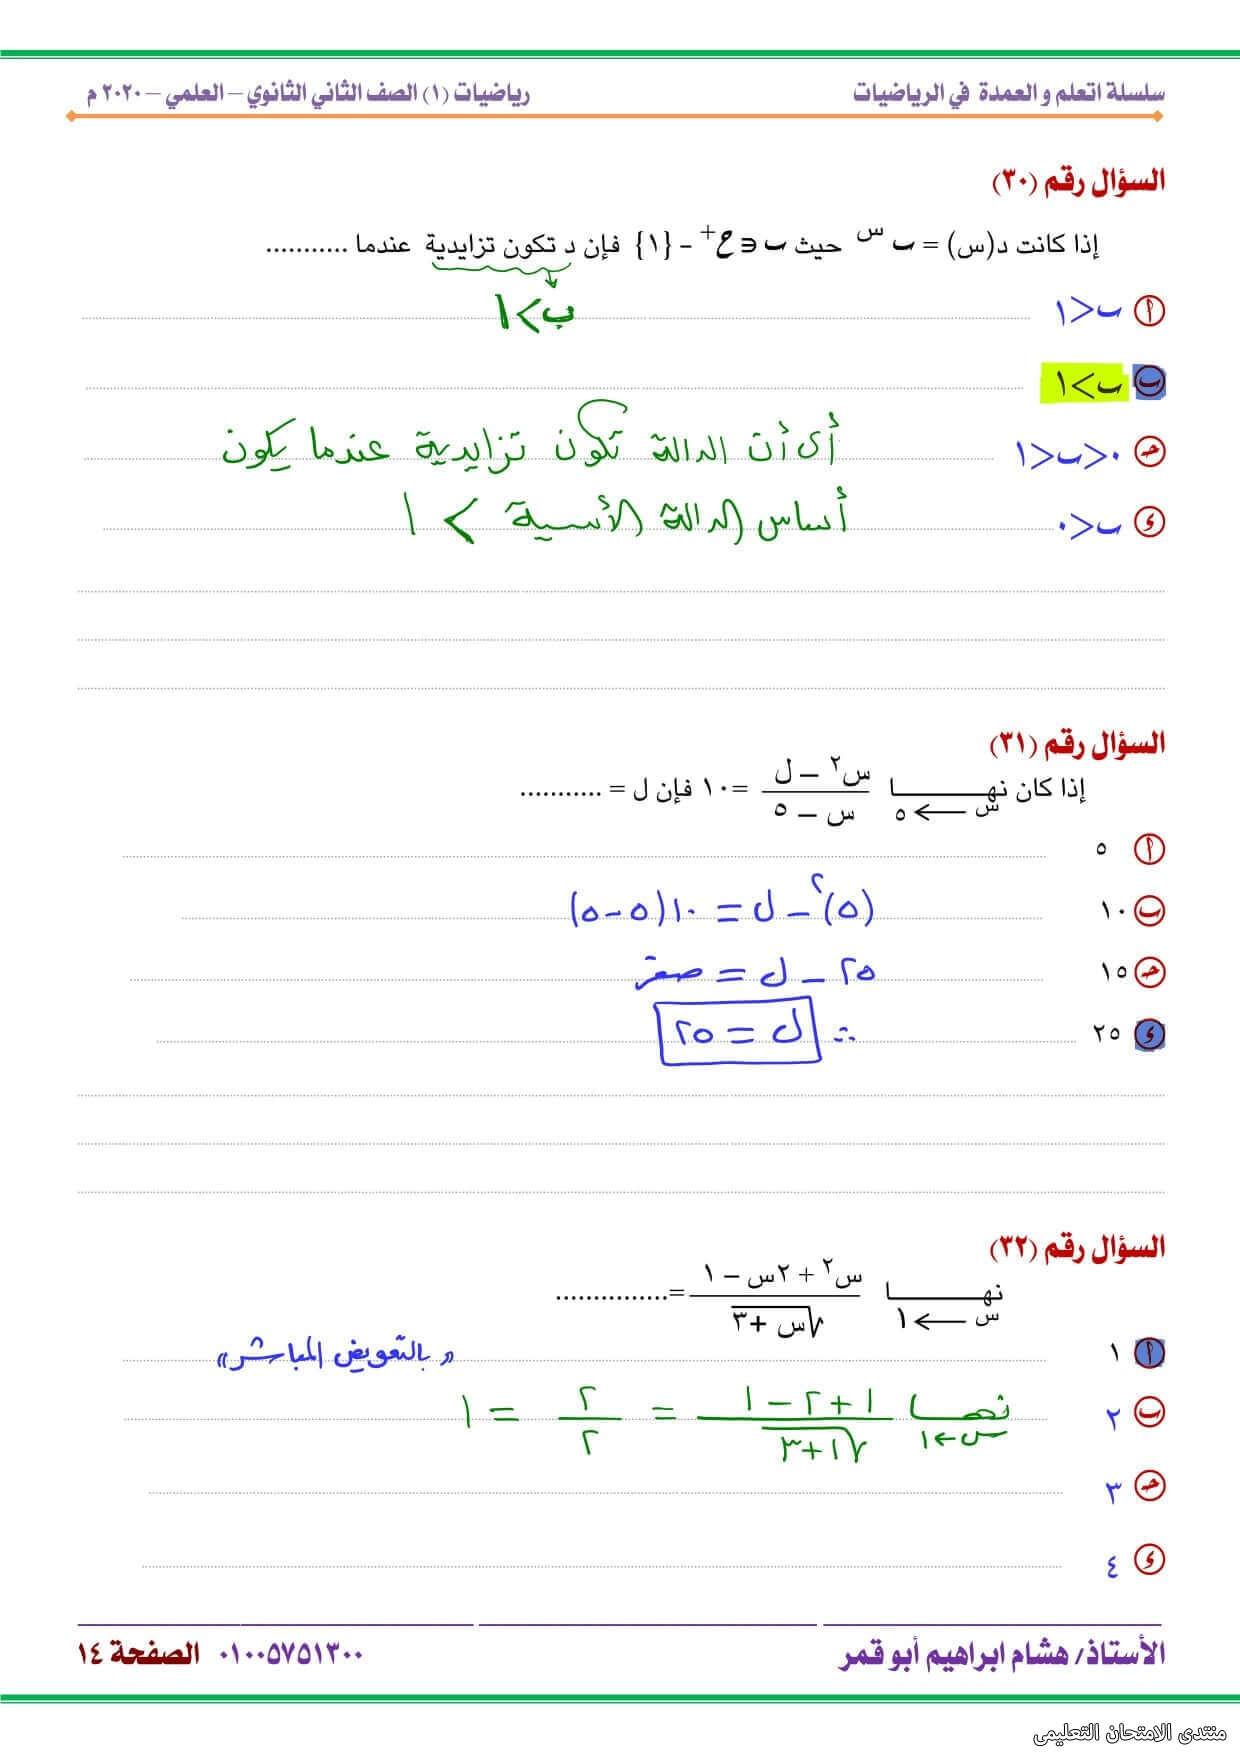 exam-eg.com_1614440949945213.jpg